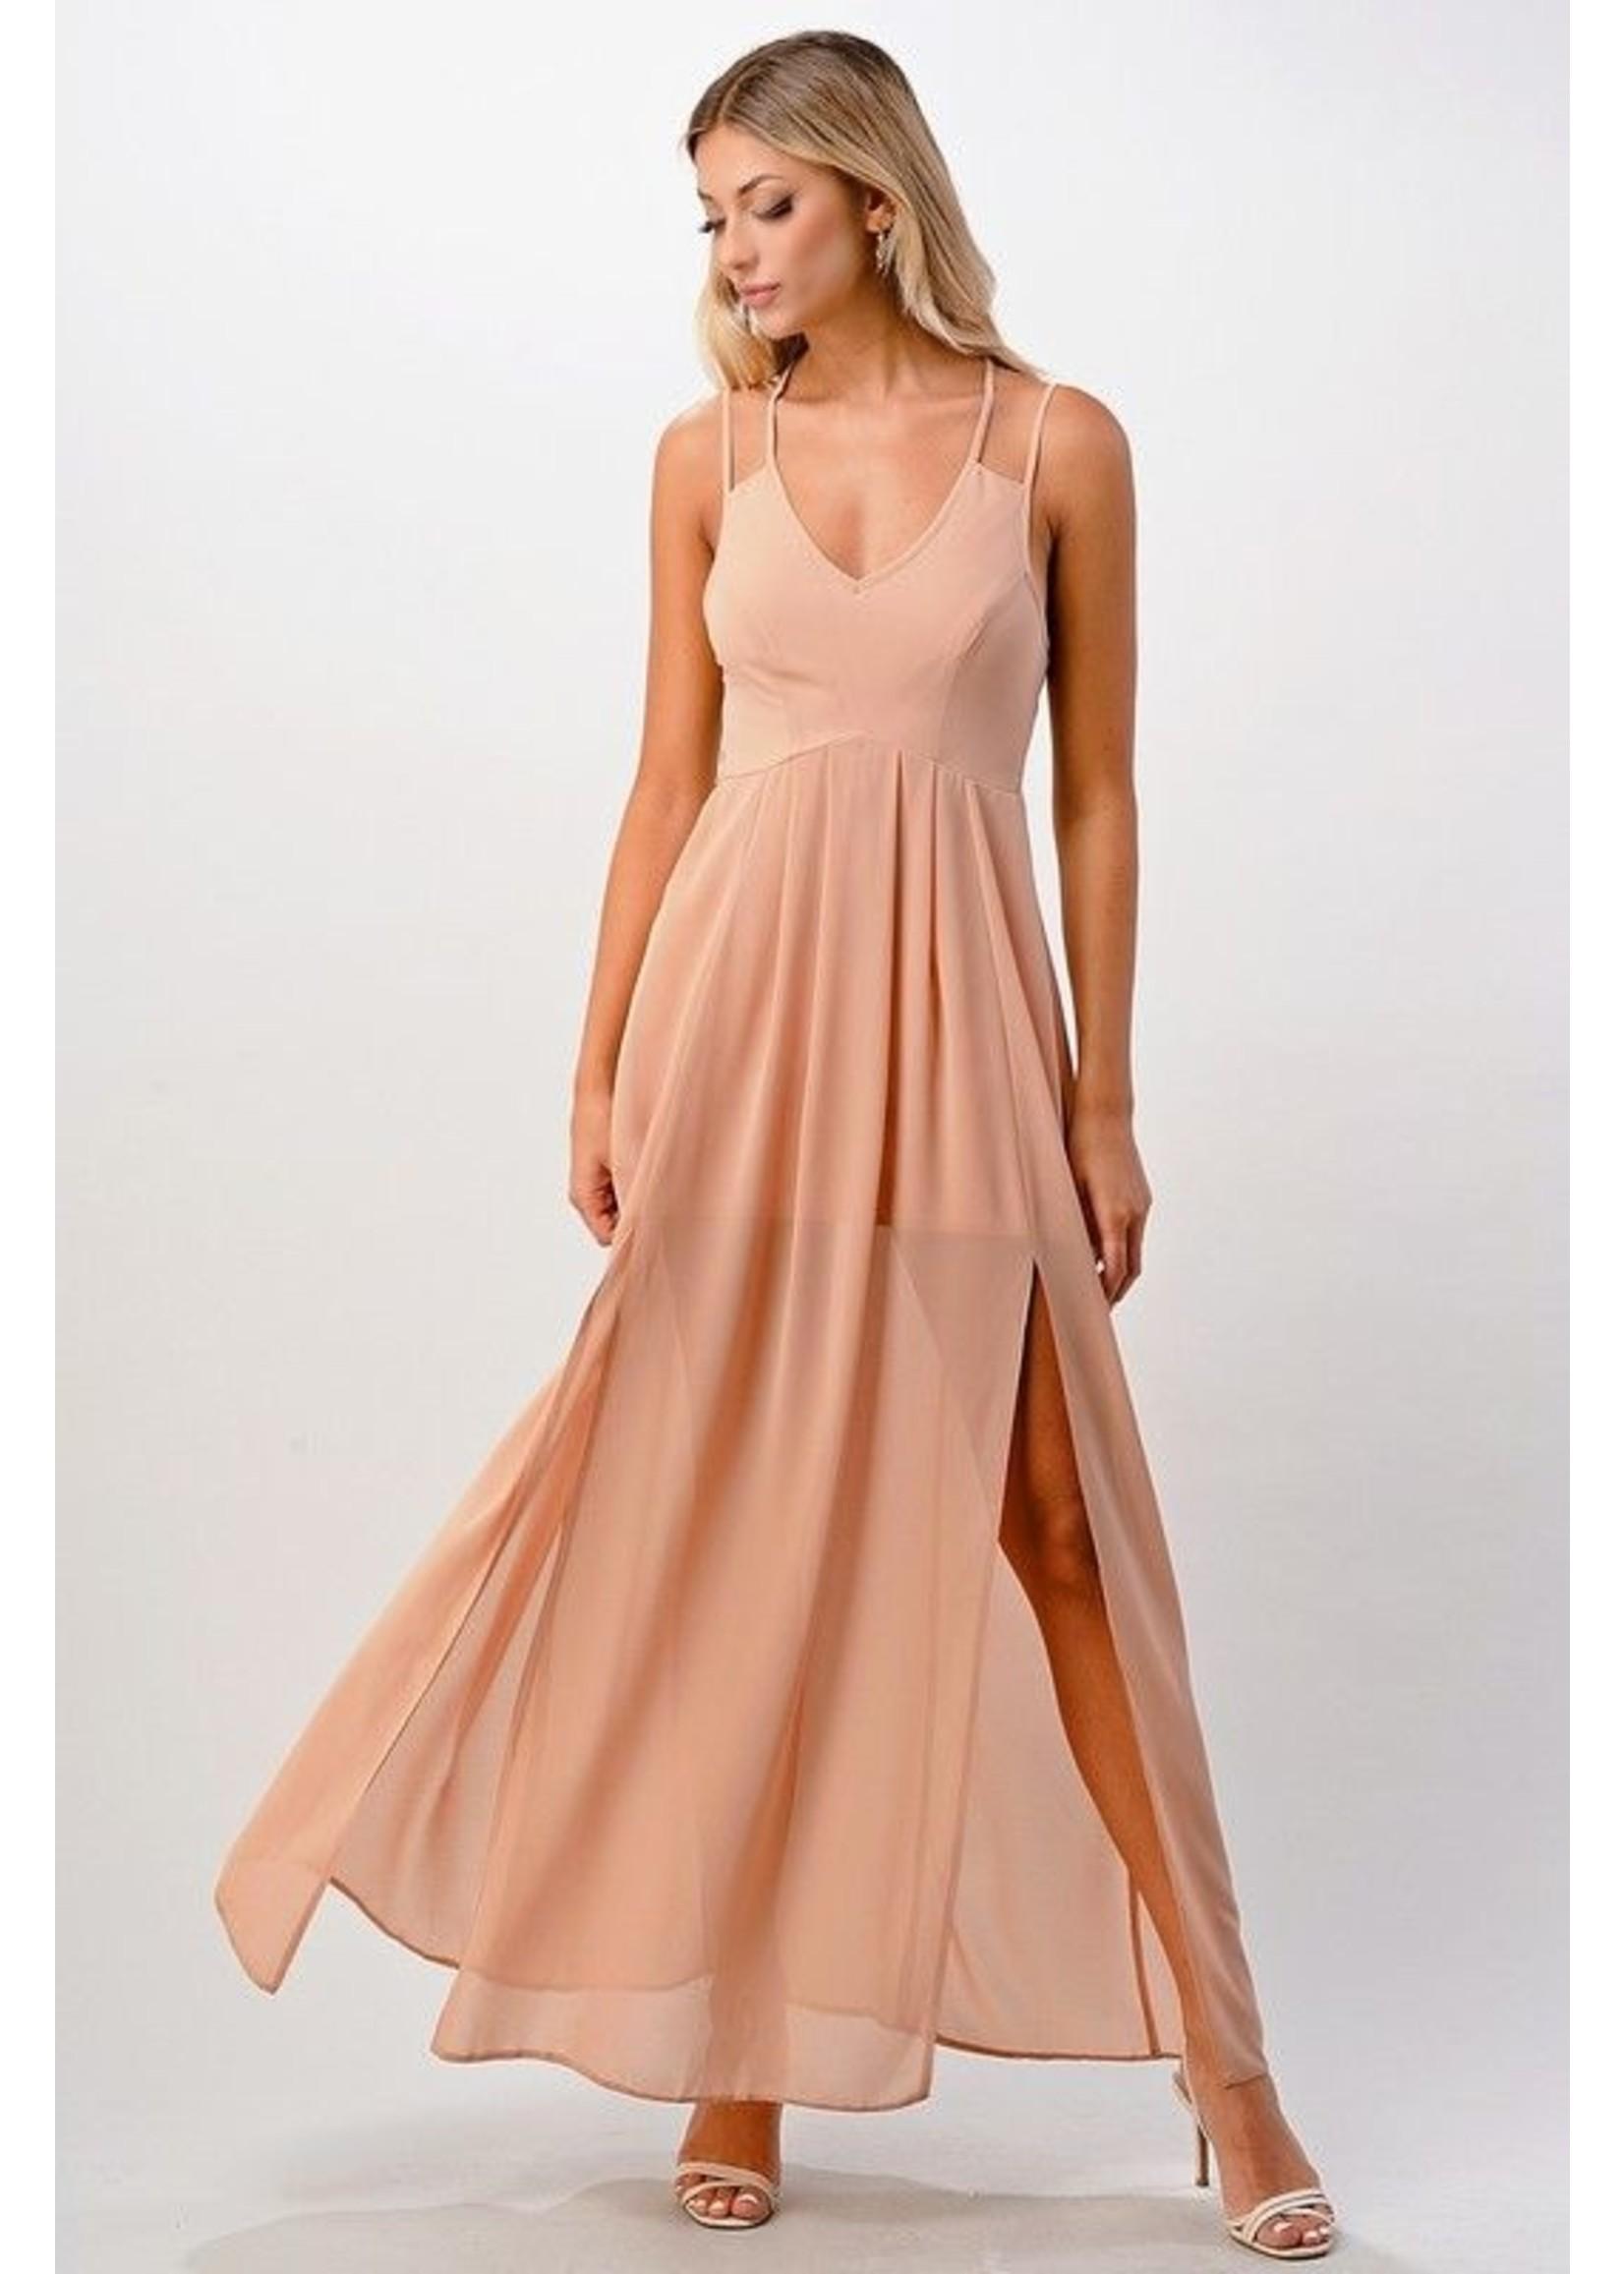 Miley + Molly Nokomis Dress Blush